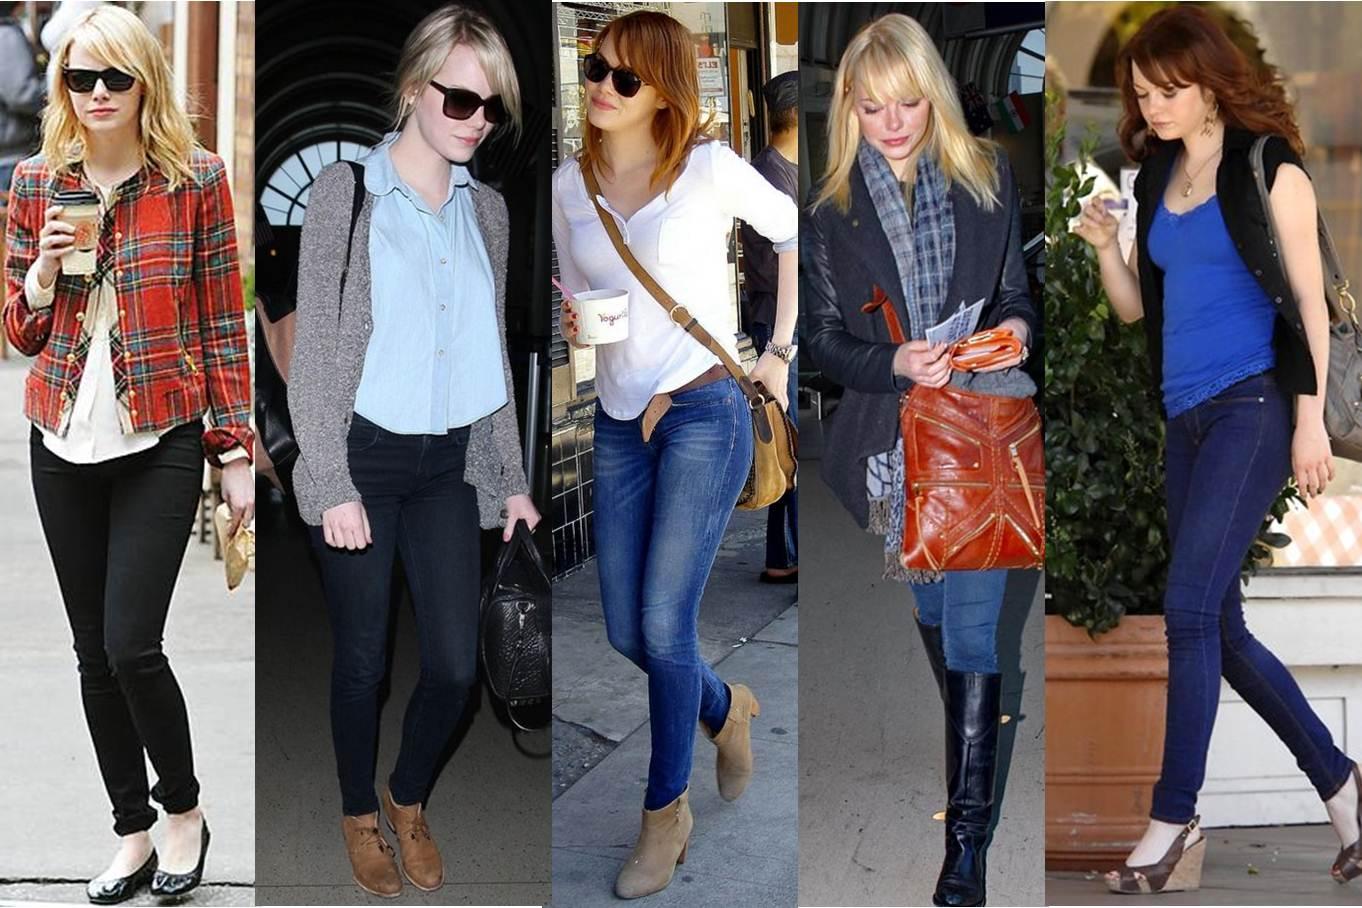 Discovering Fashion By Angie Emma Stone Rubia O Pelirroja